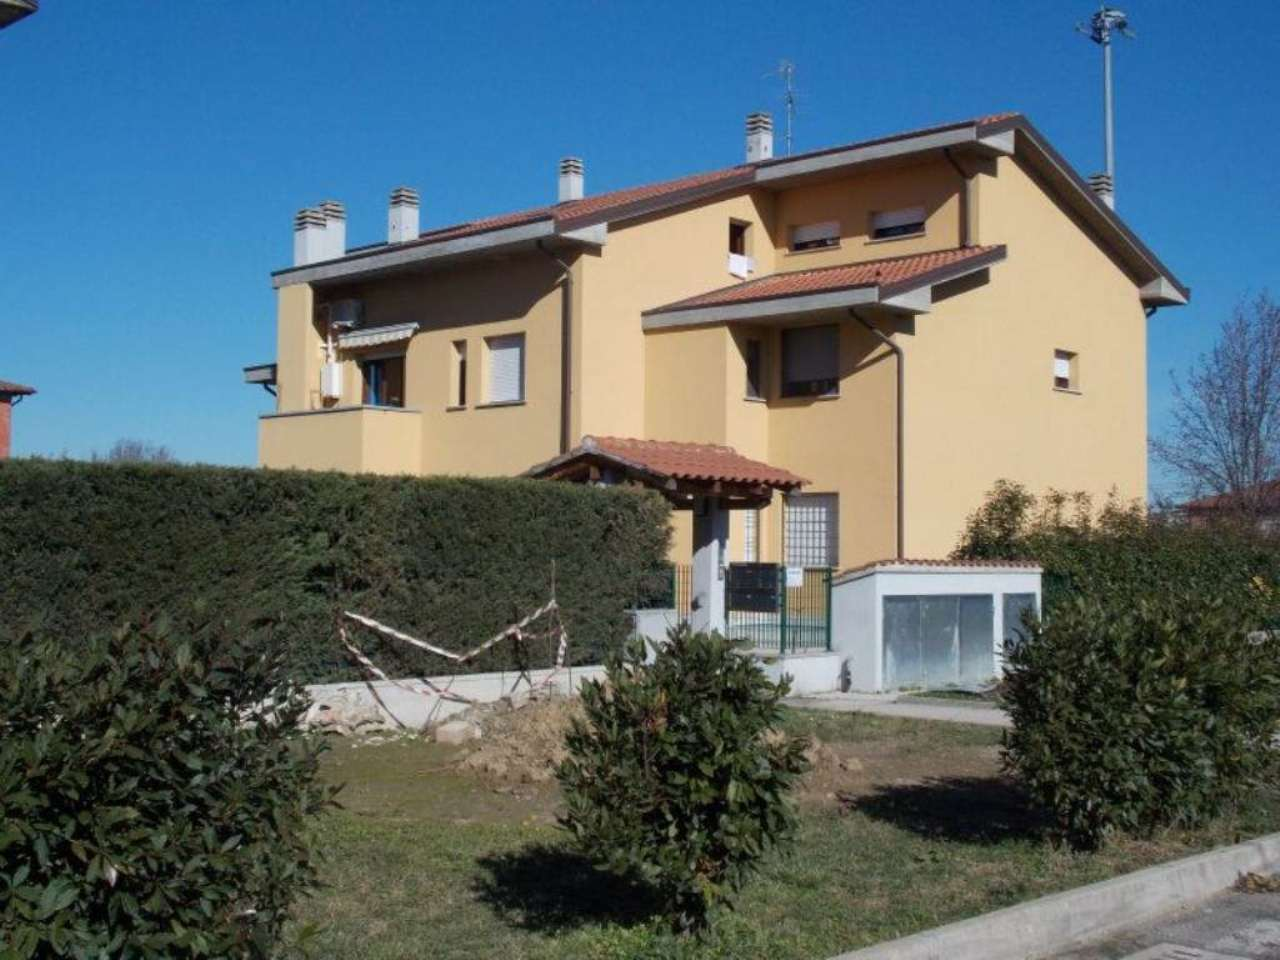 Bilocale Castel San Pietro Terme Via Pilastrino 1